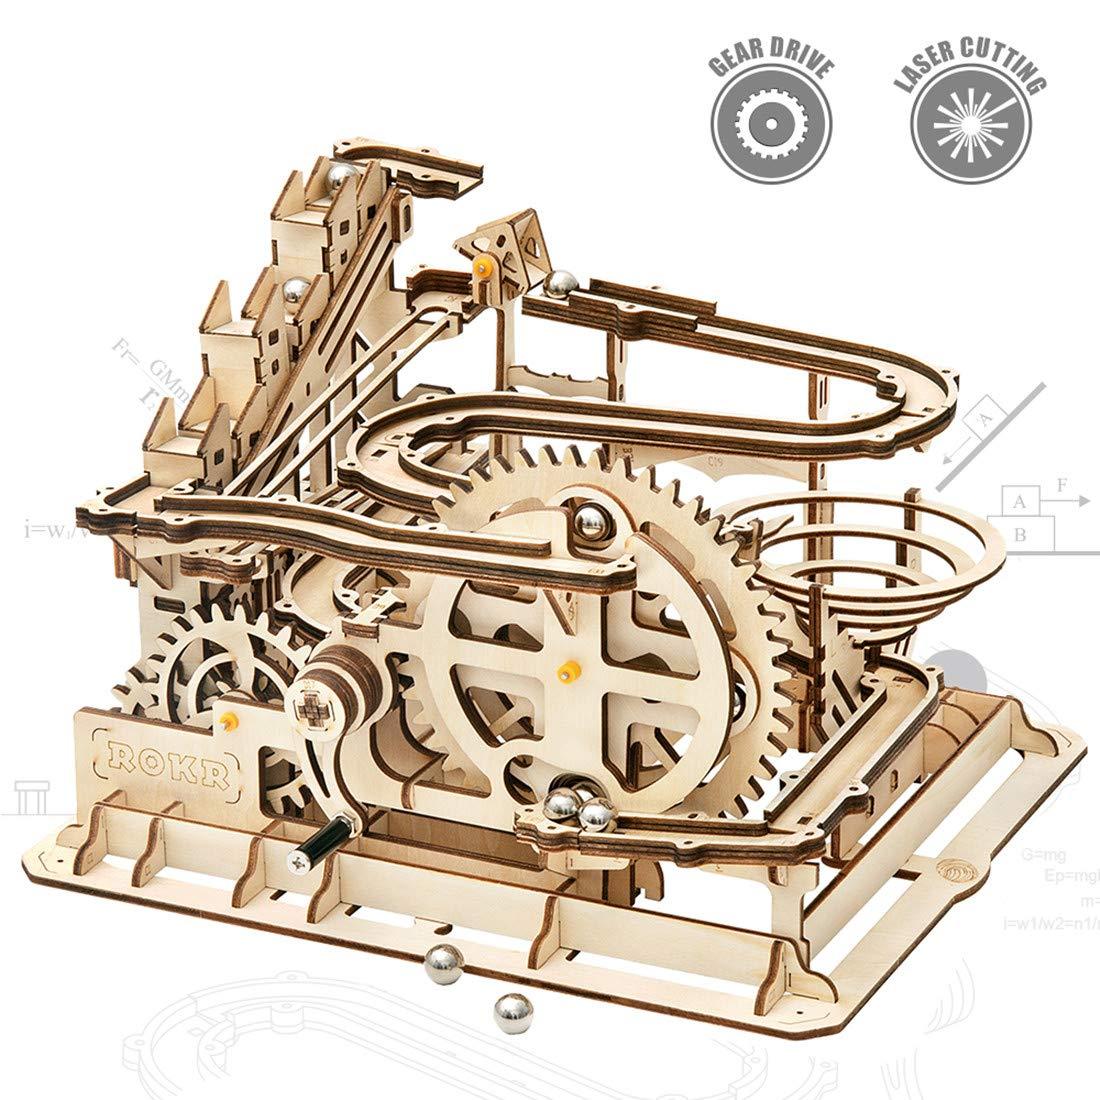 ROKR Mechanical 3D Wooden Puzzle Model Kit Adult